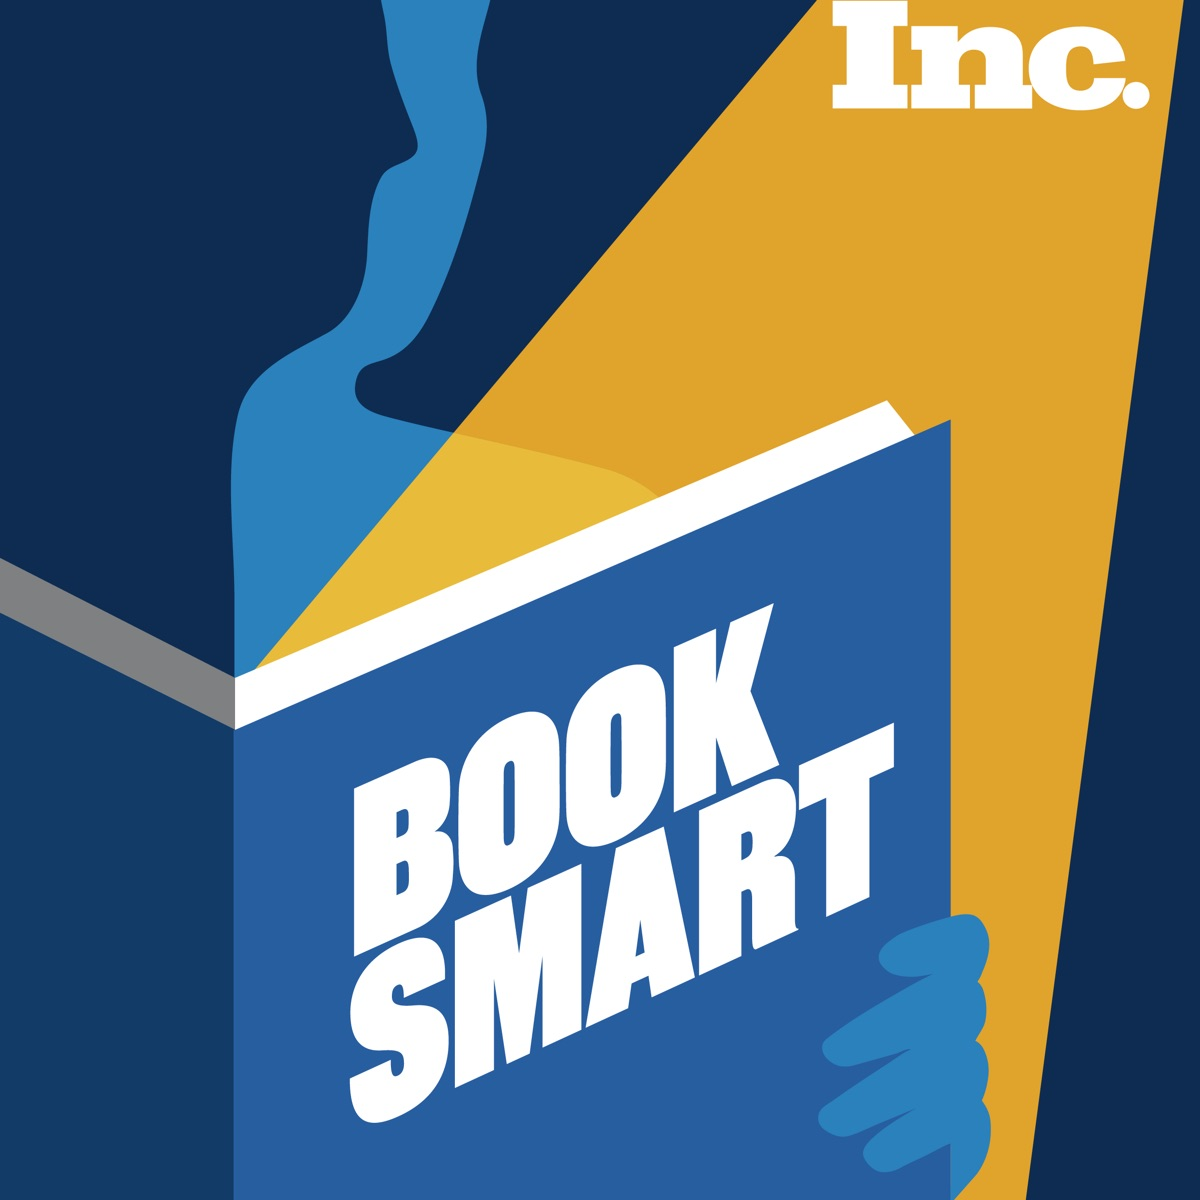 Inc. Book Smart